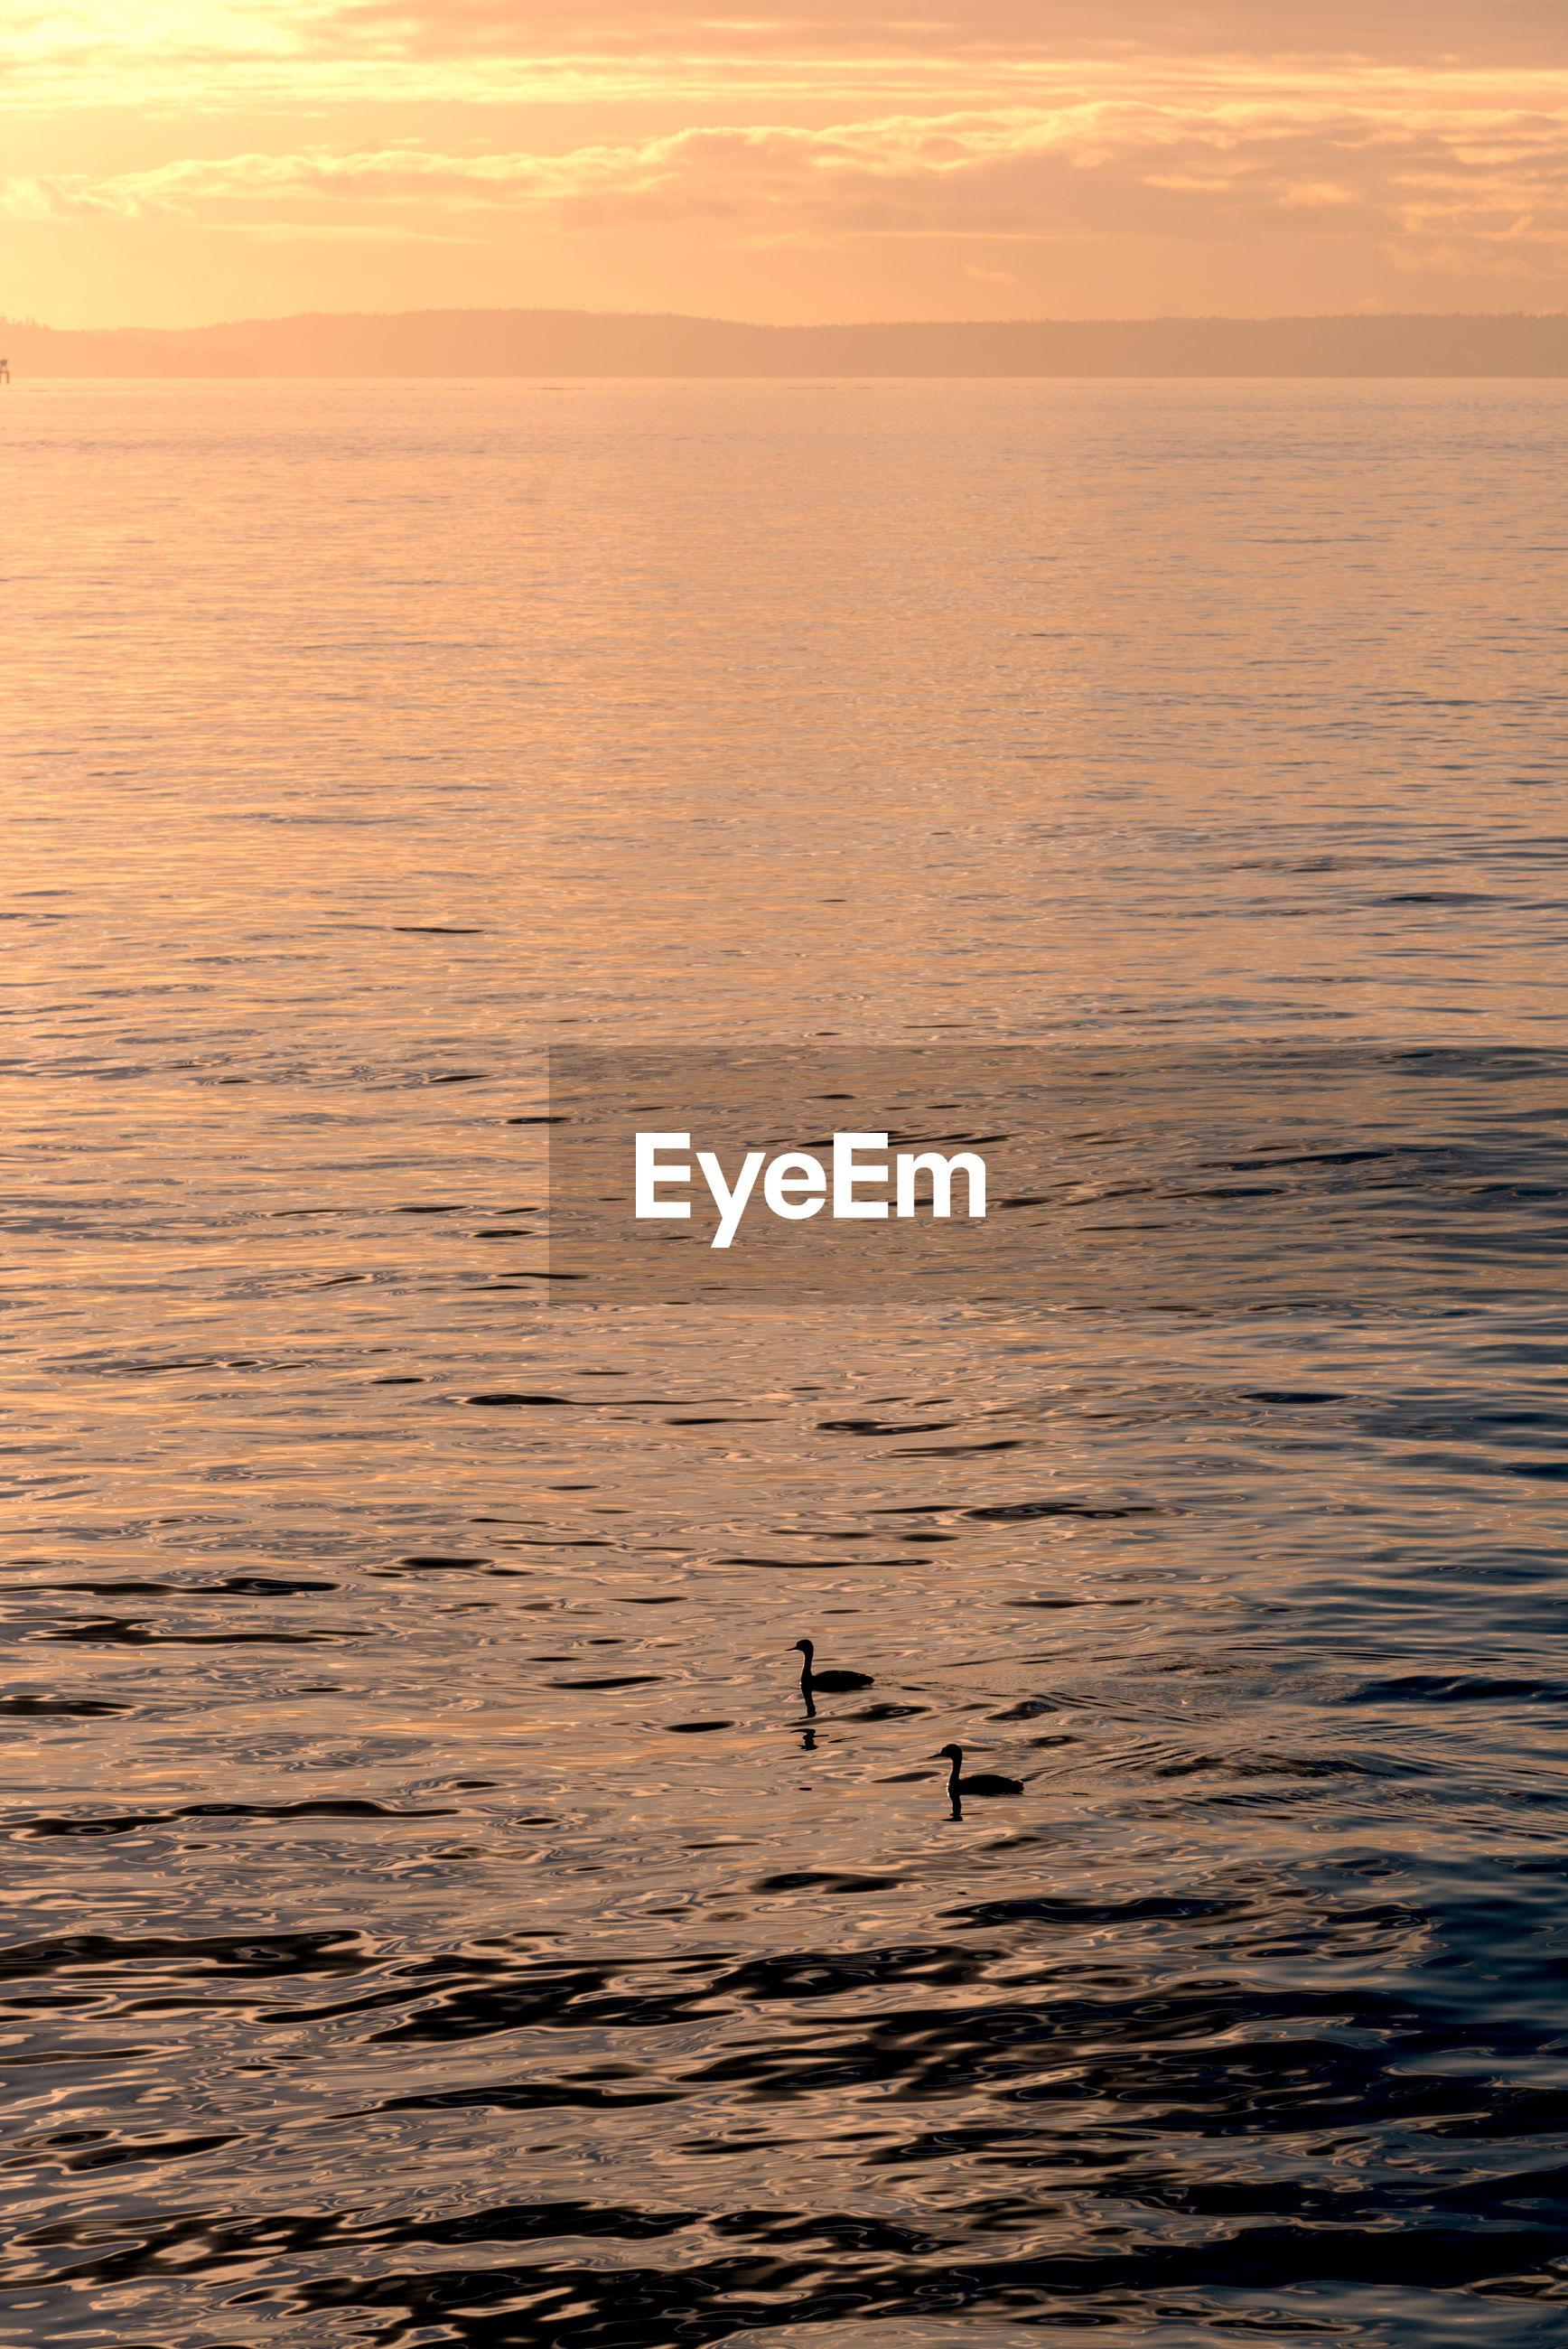 Water birds at sunset on elliott bay.